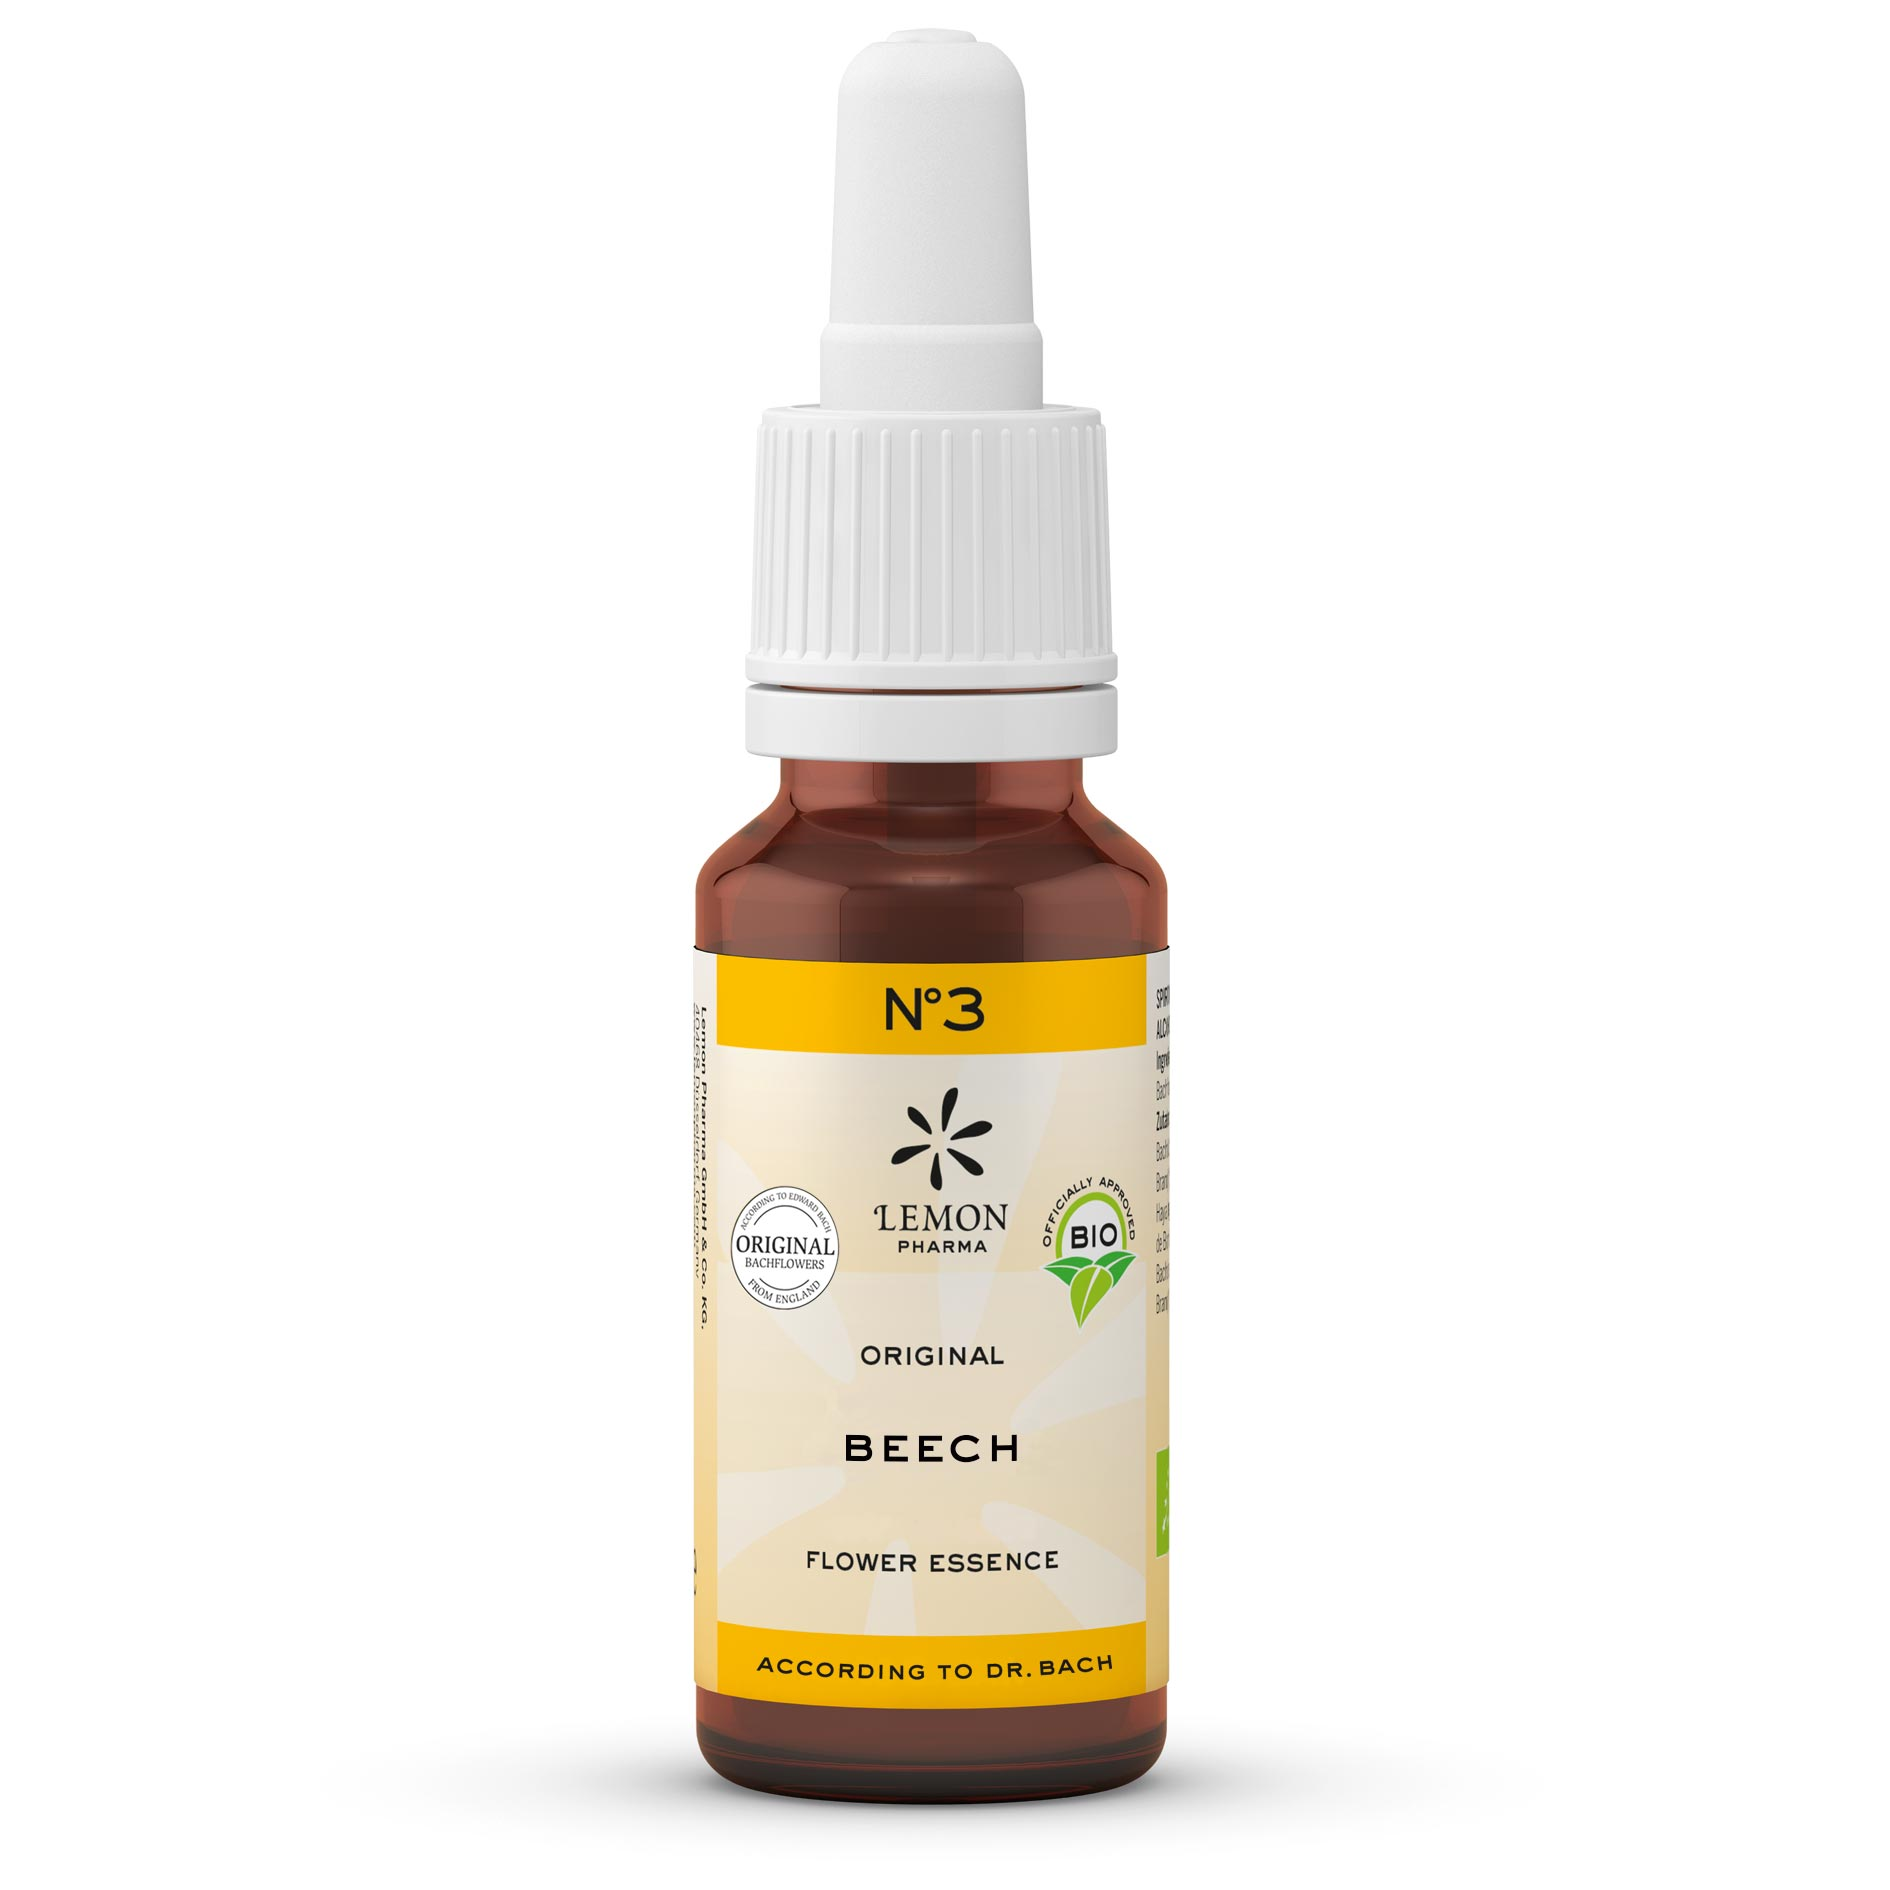 Lemon Pharma Original Bachblüten Tropfen Nr 3 Beech Rotbuche Toleranz Murnauers